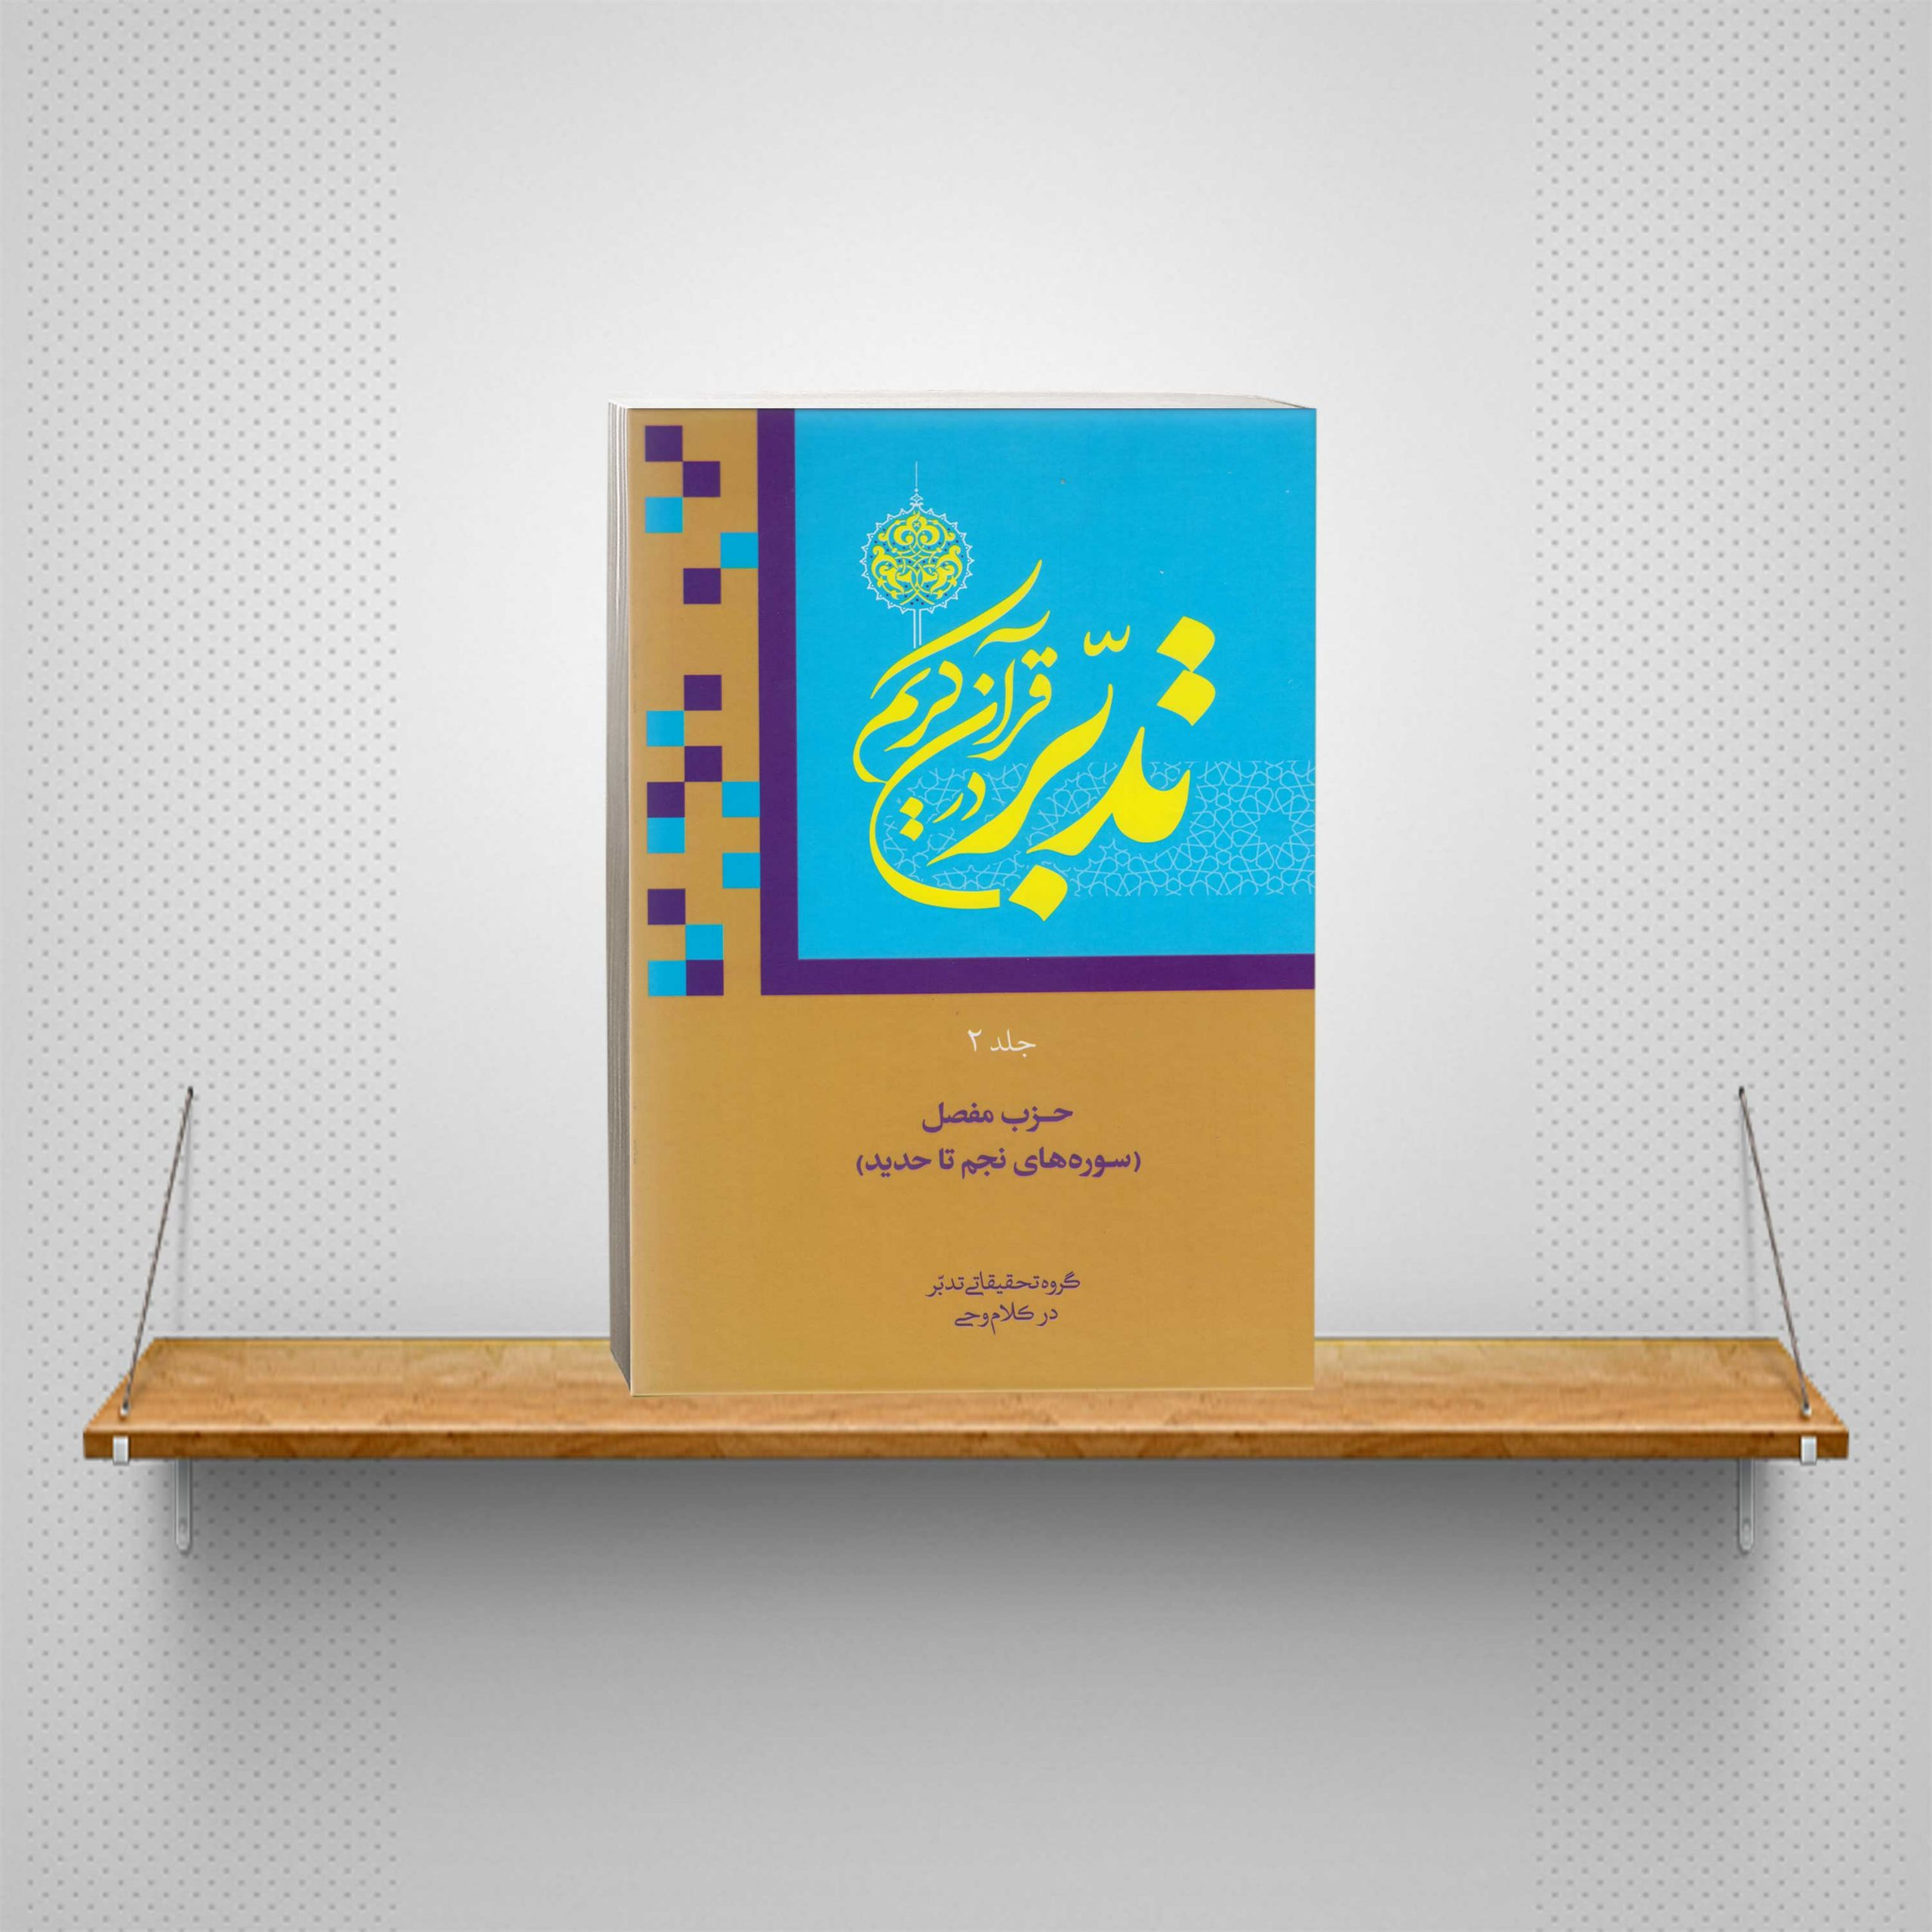 تدبردر قرآن جلد2